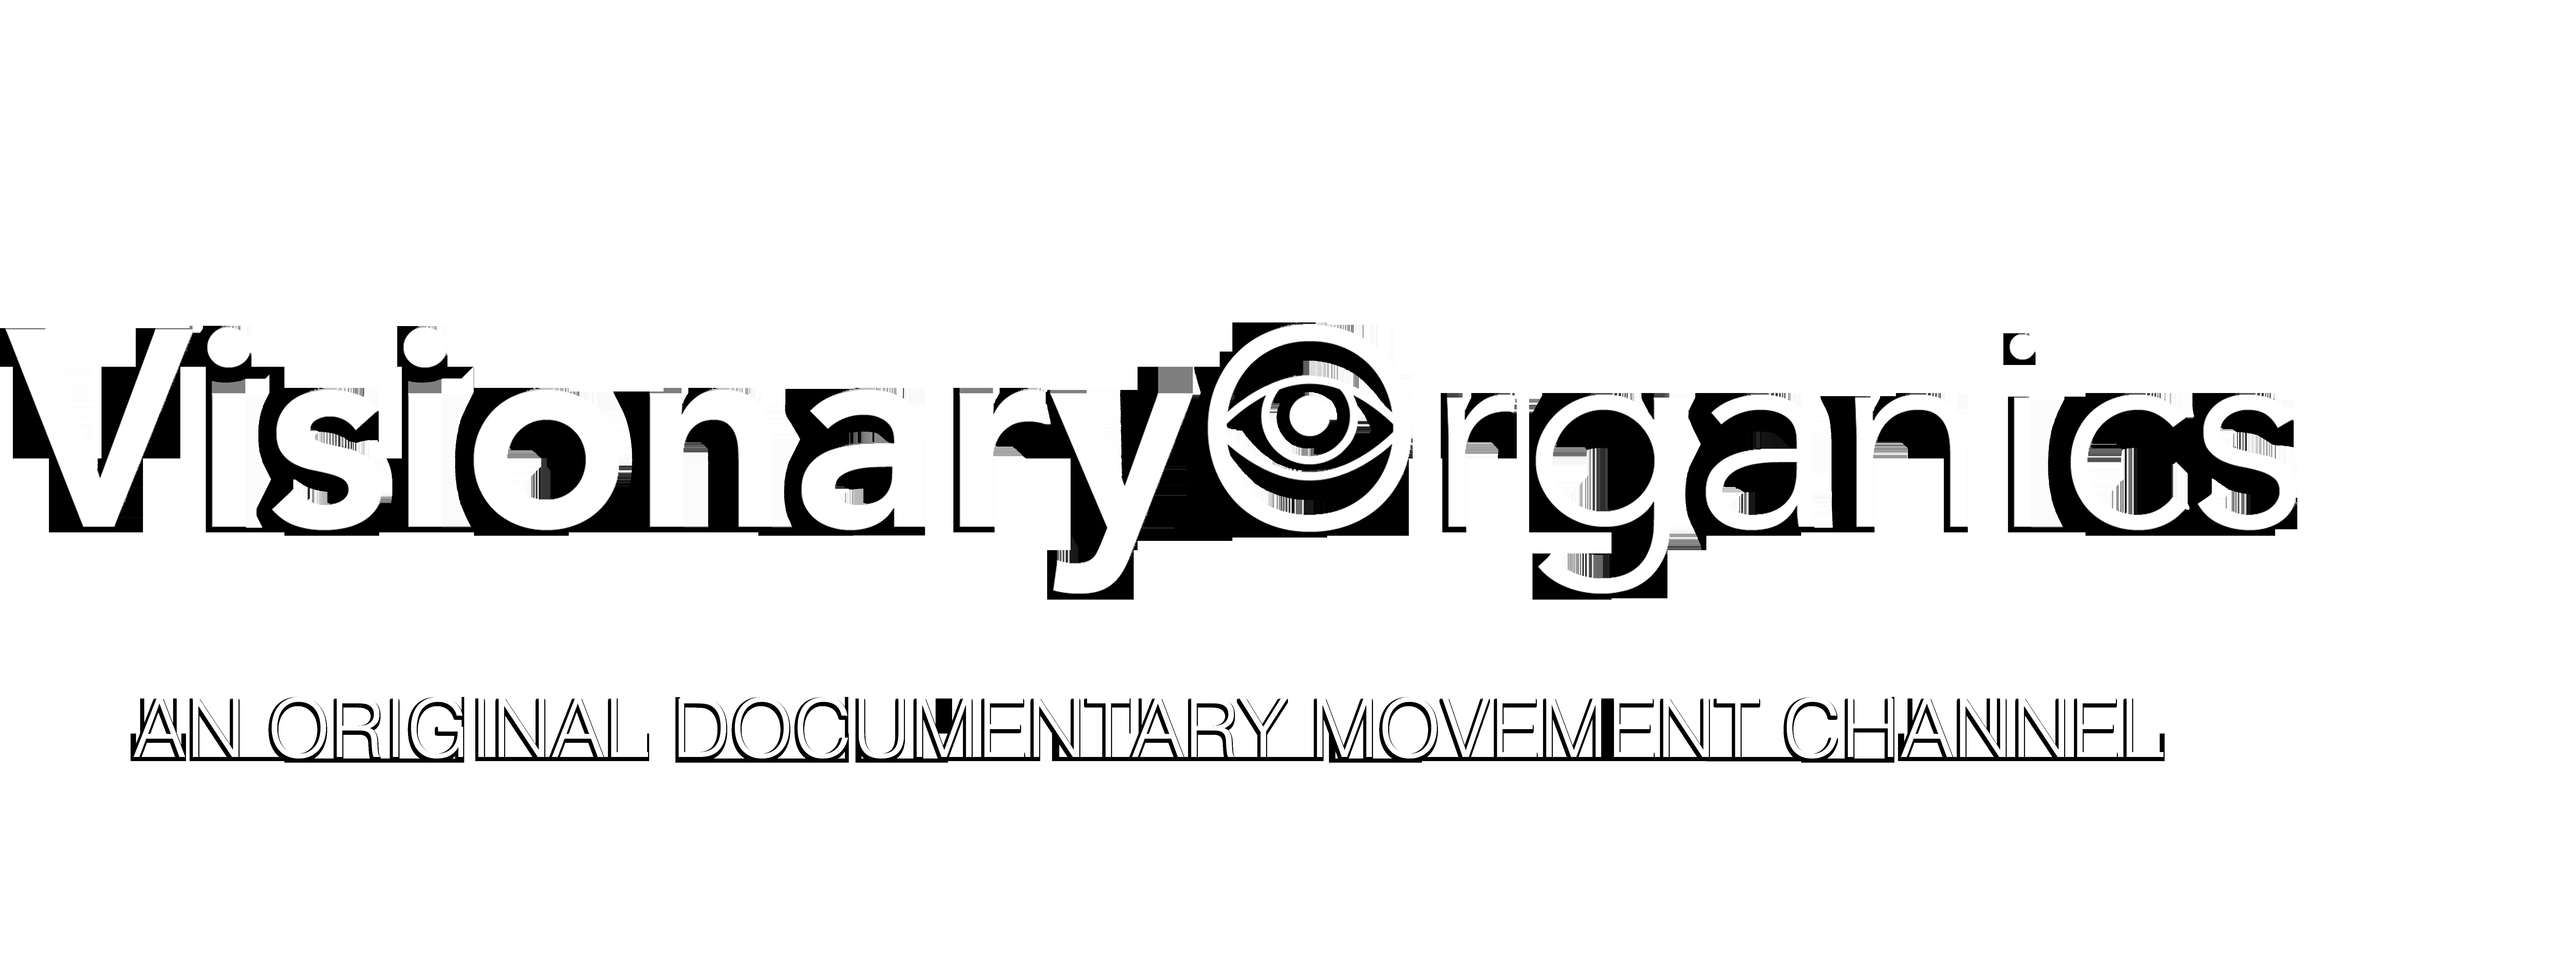 Visionary Organics